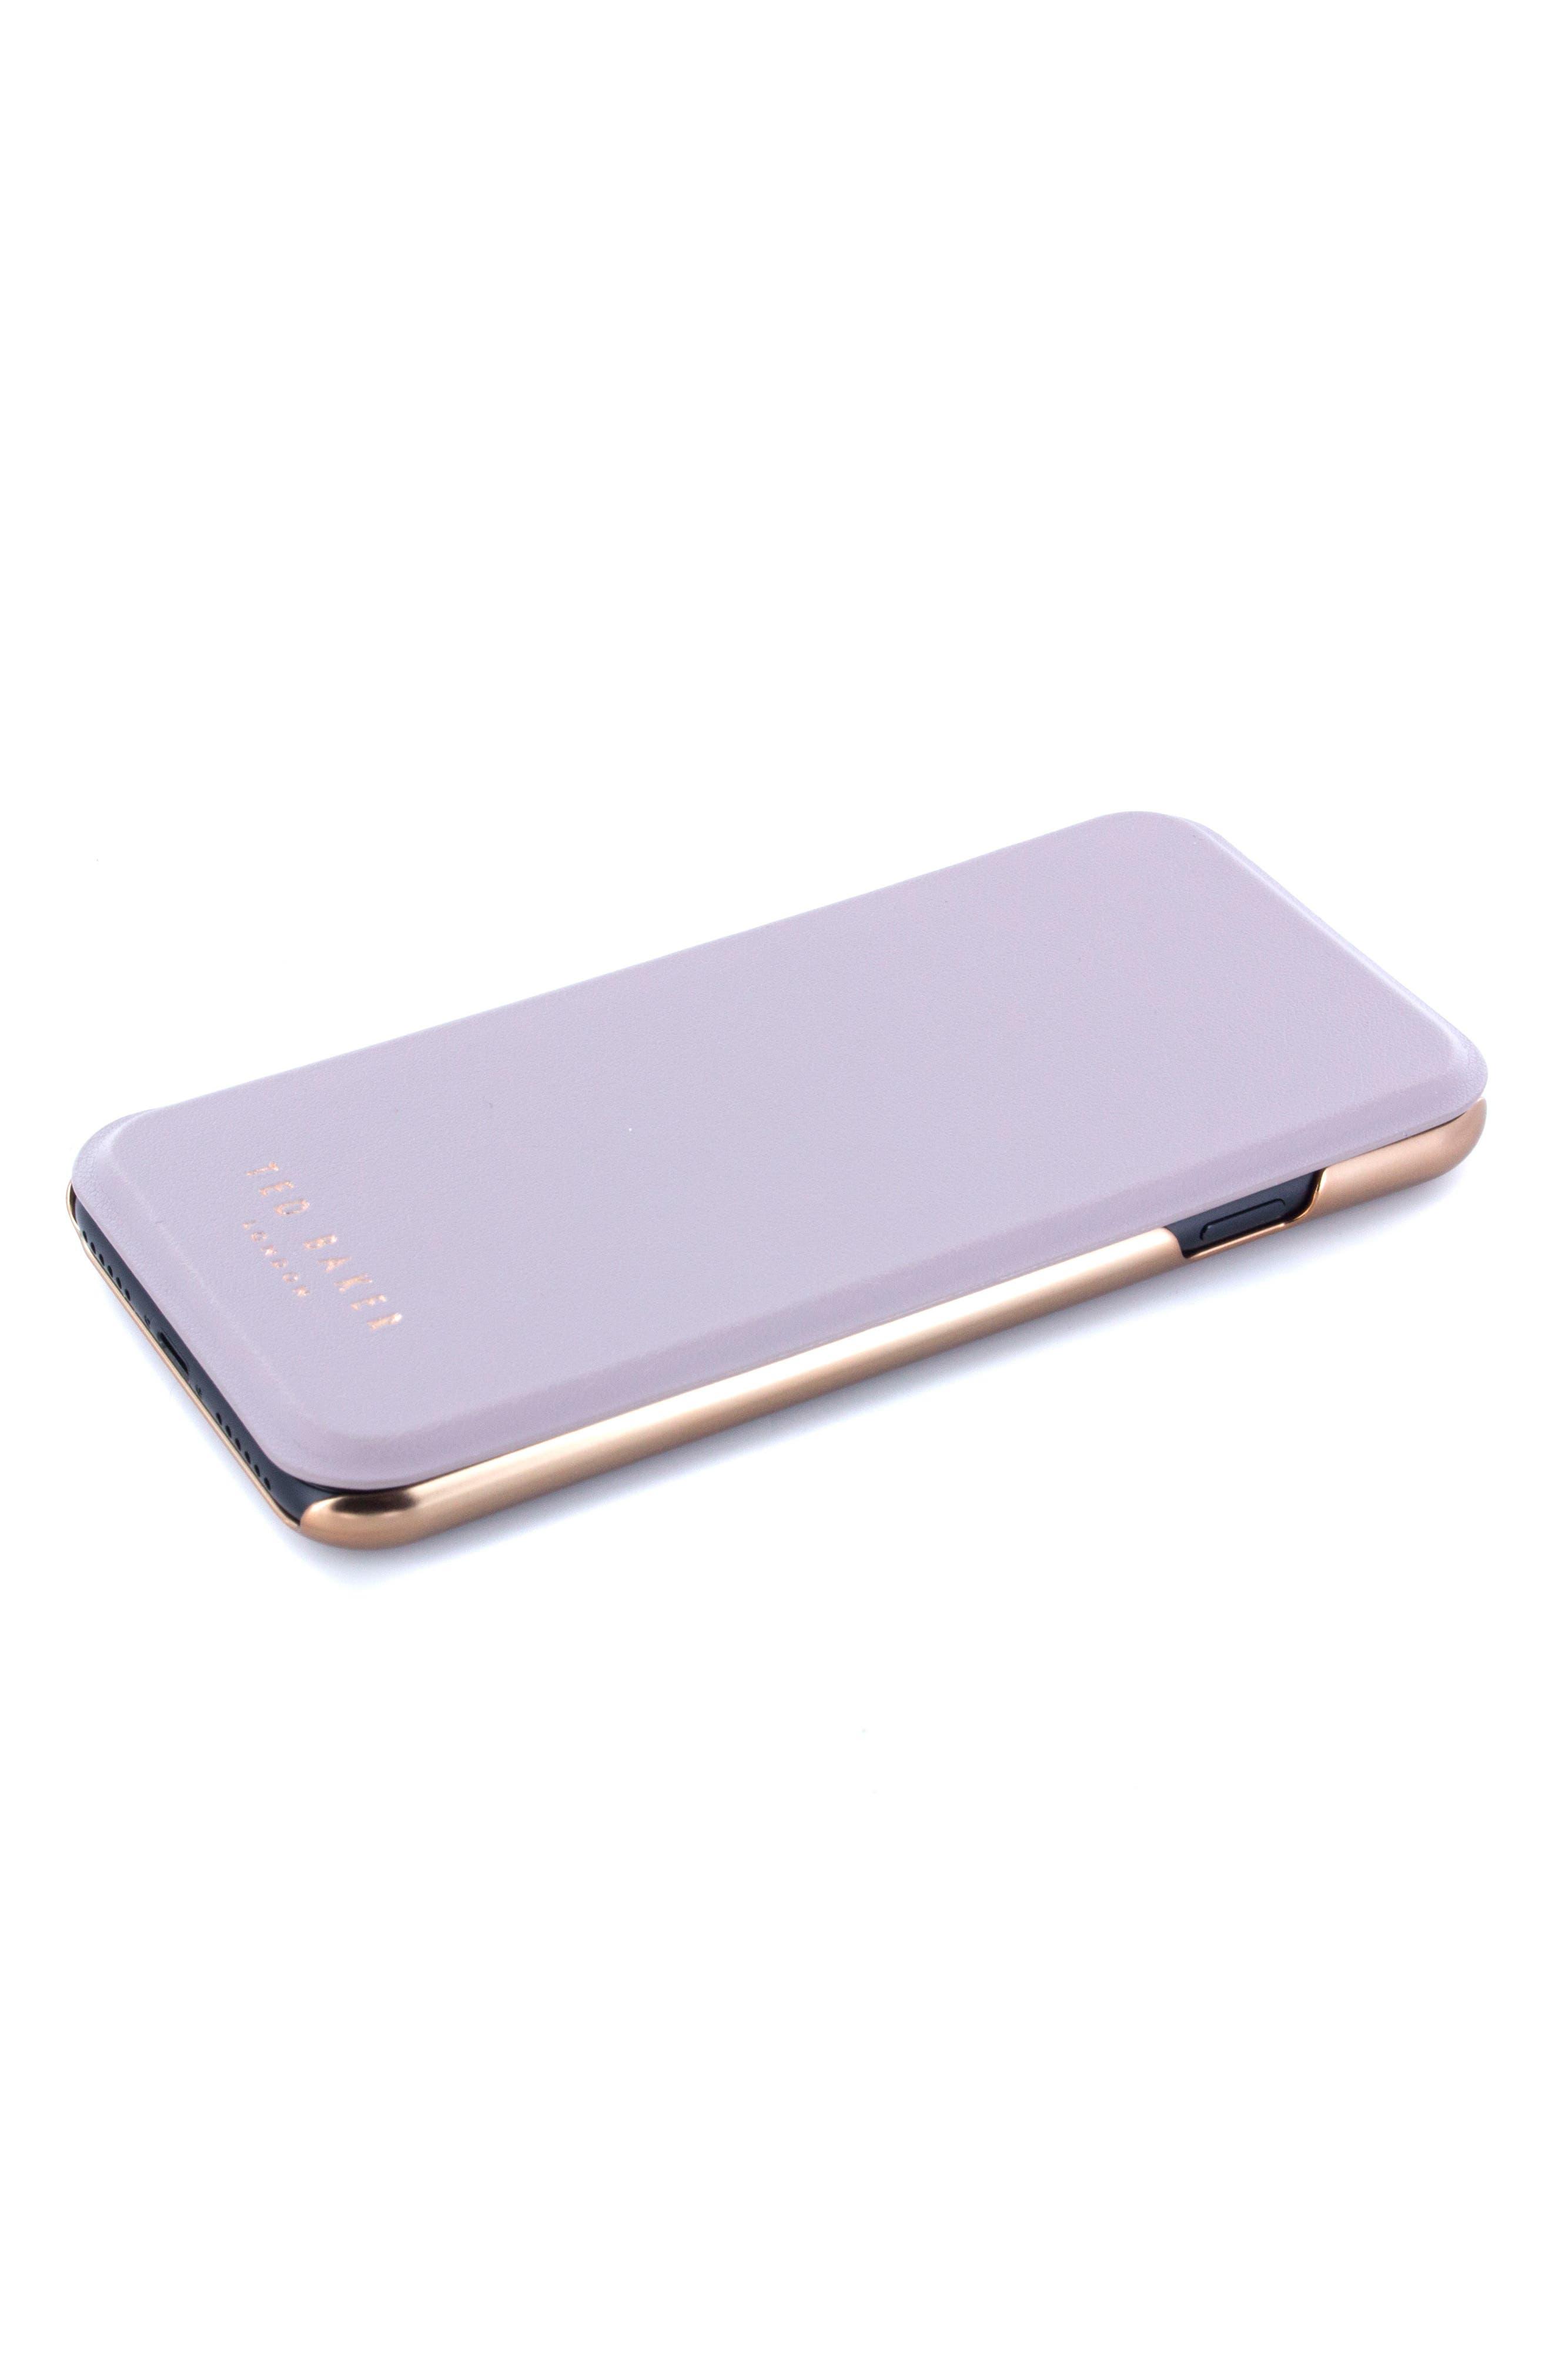 Shannon iPhone 6/6s/7/8 & 6/6s/7/8 Plus Mirror Folio Case,                             Alternate thumbnail 5, color,                             530